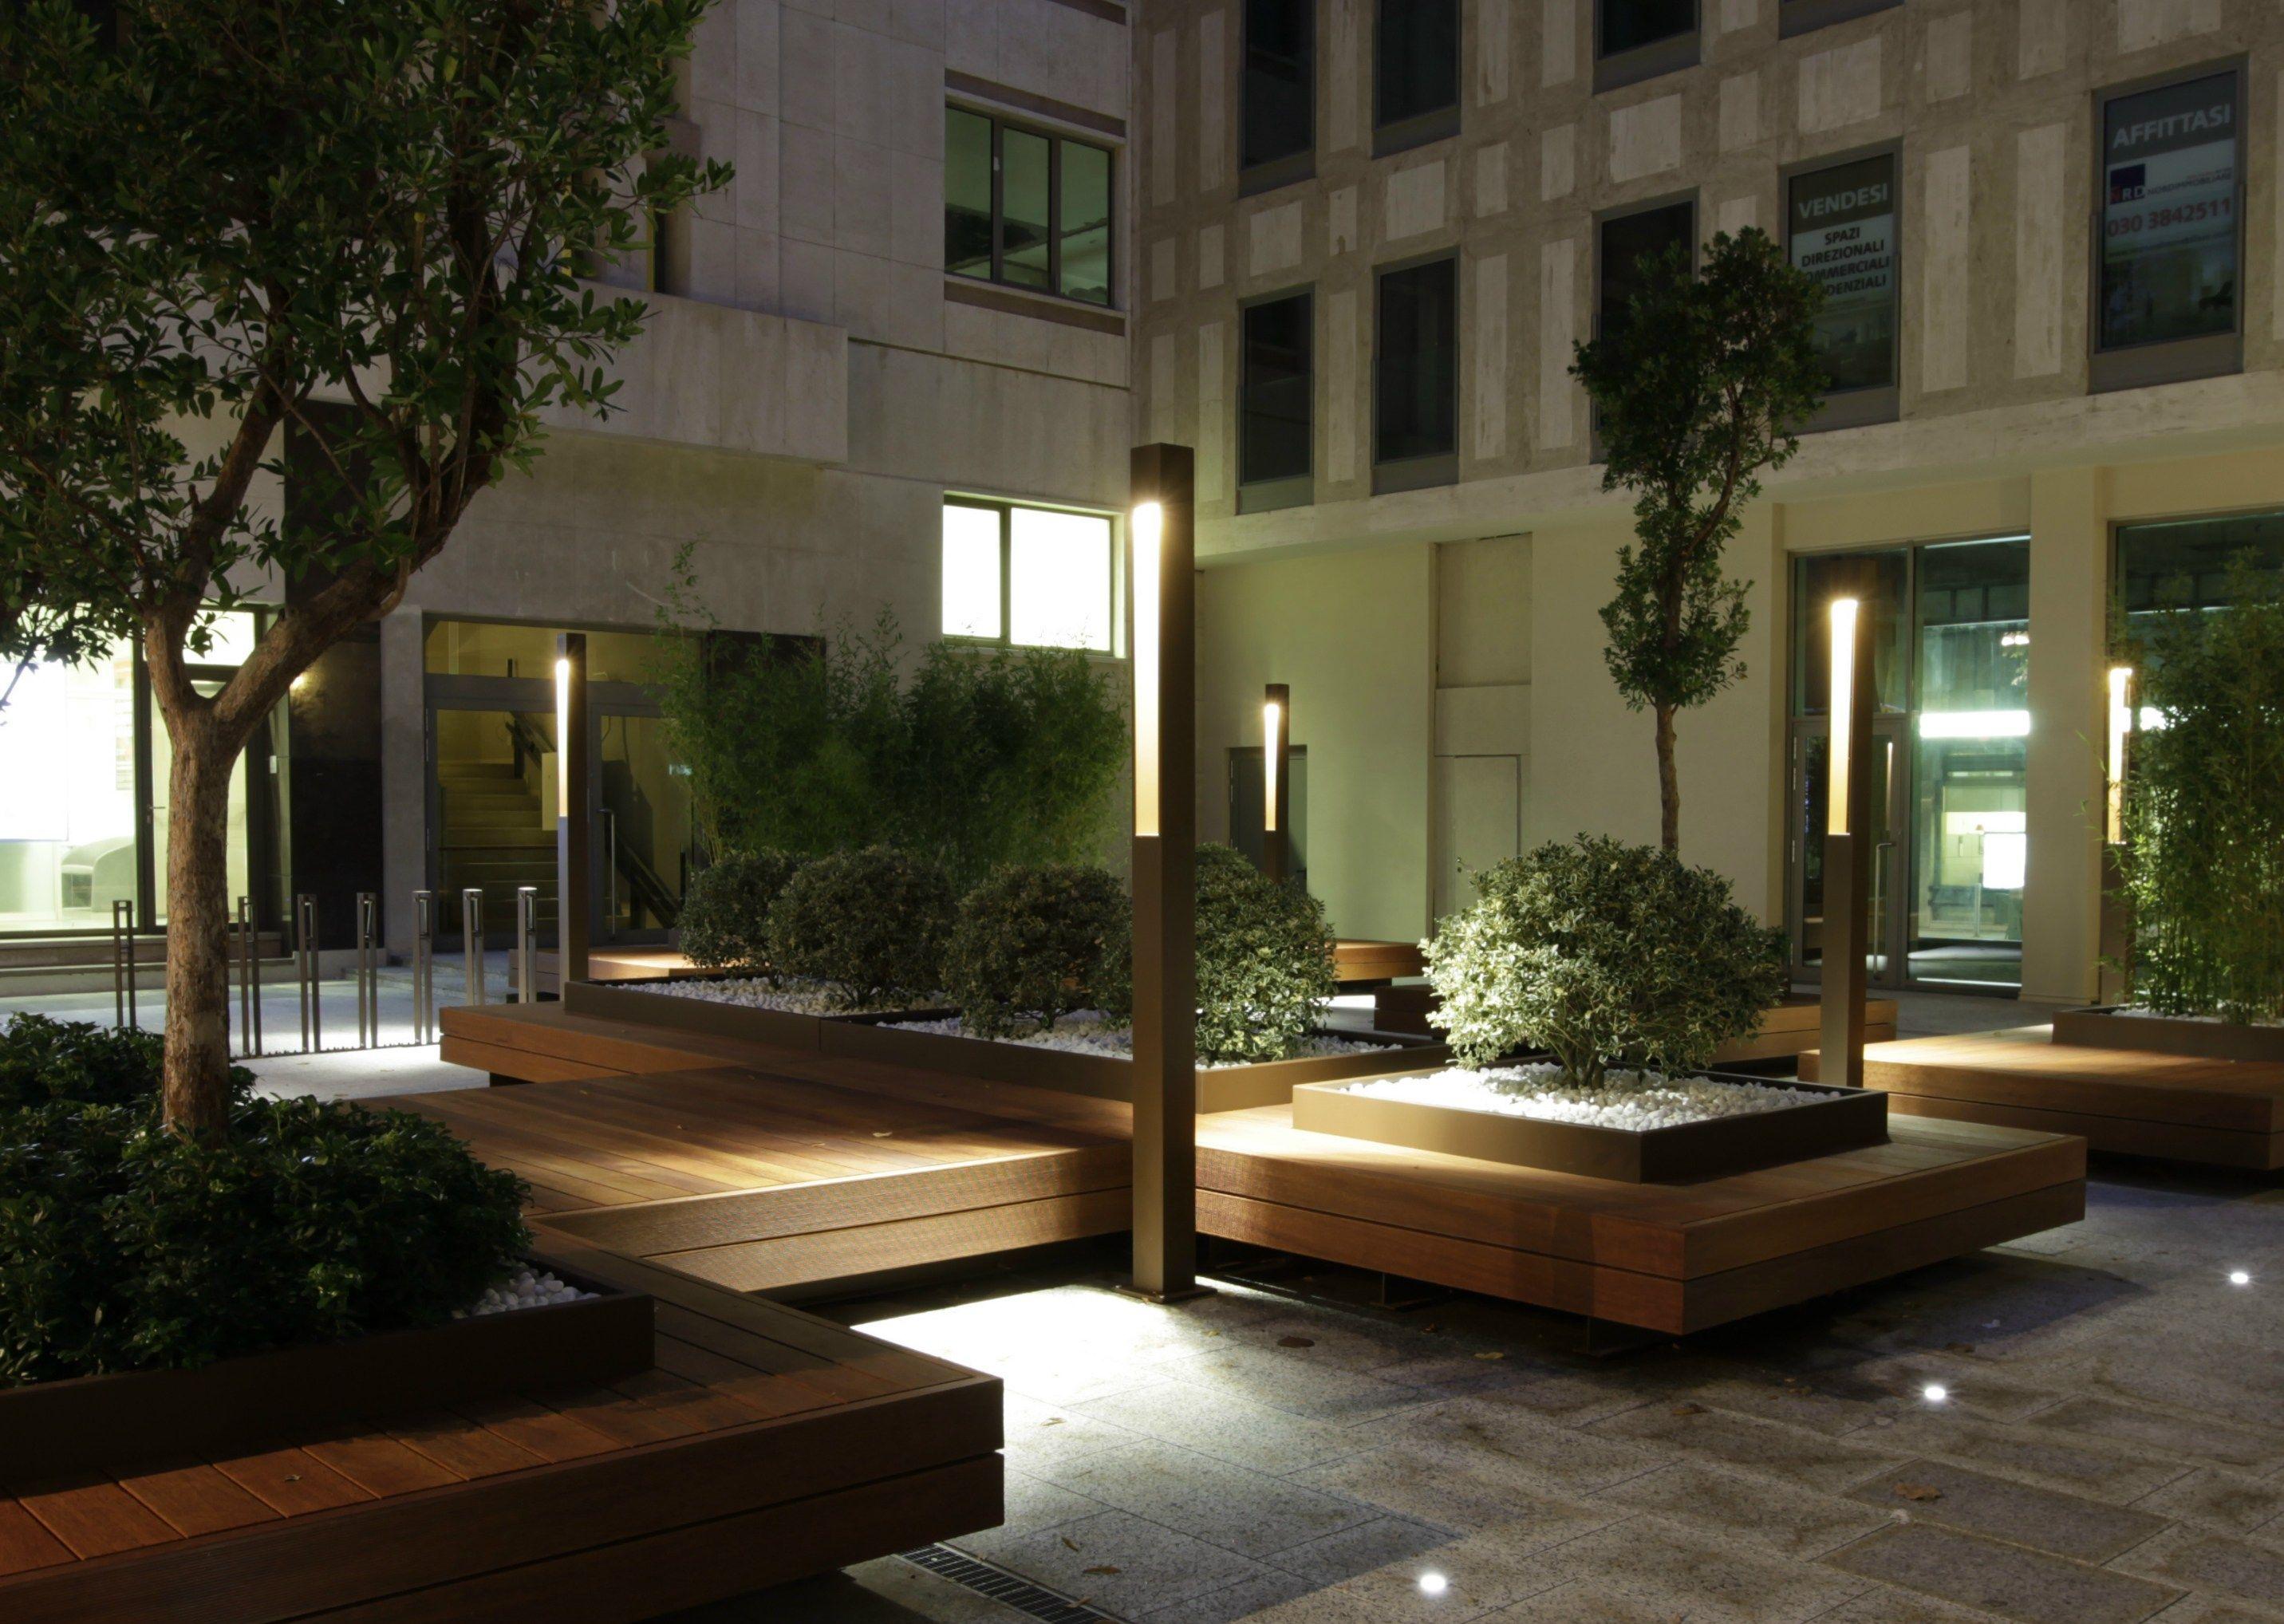 Paletto luminoso da giardino TETRA PARCO Paletto luminoso per spazi by Platek